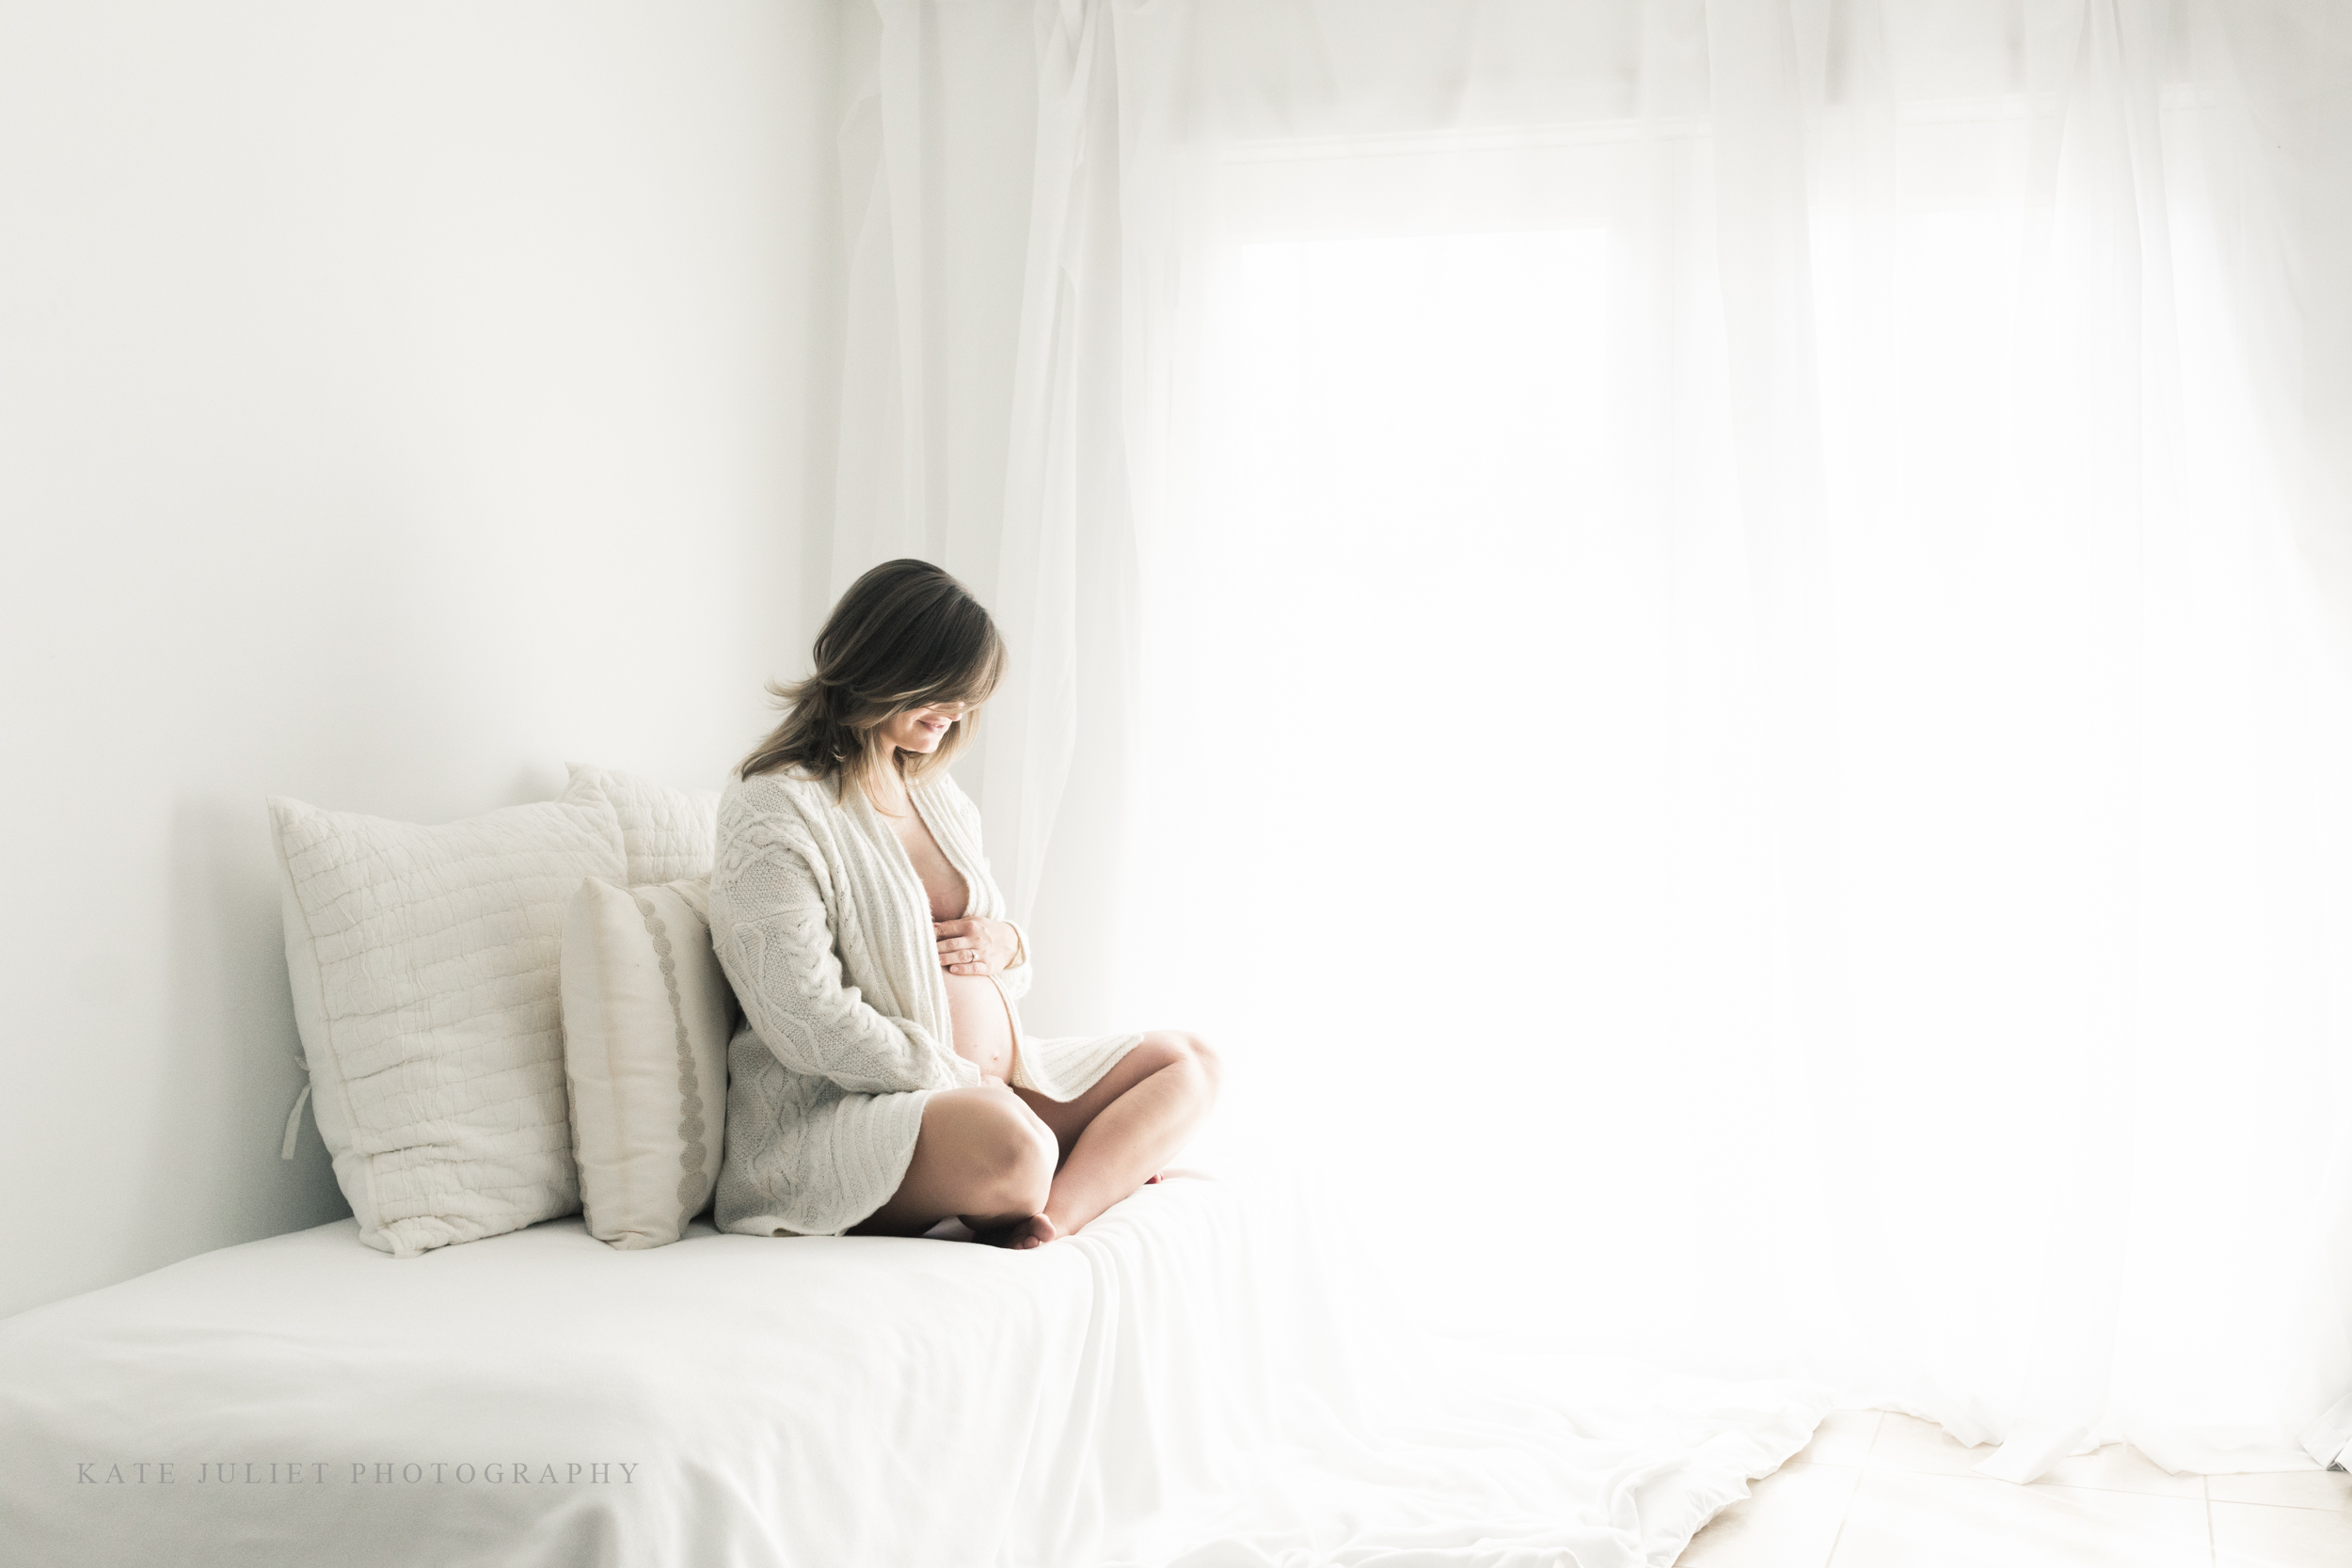 Washington DC Maternity Pregnancy Photographer | Kate Juliet Photography